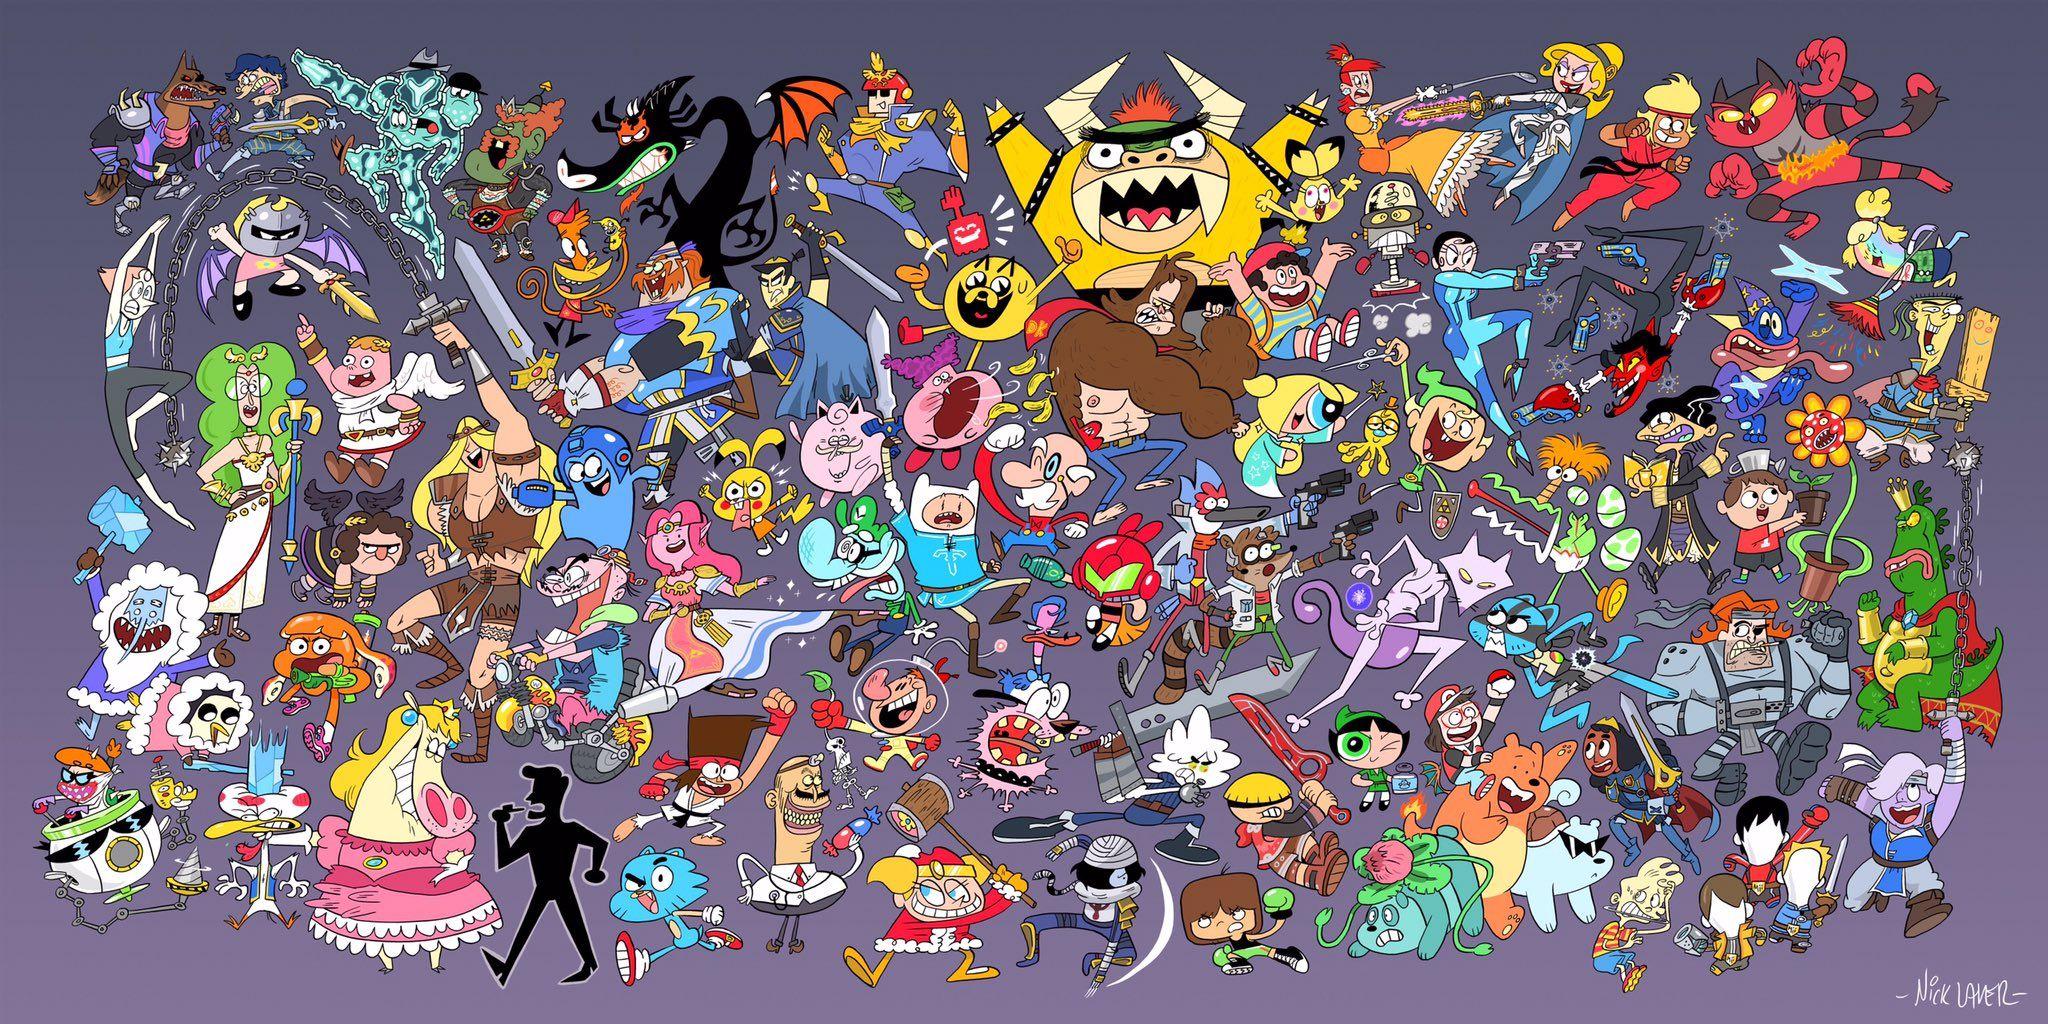 Nick Lauer On Twitter Super Smash Bros Cartoon Network Characters Cartoon Network